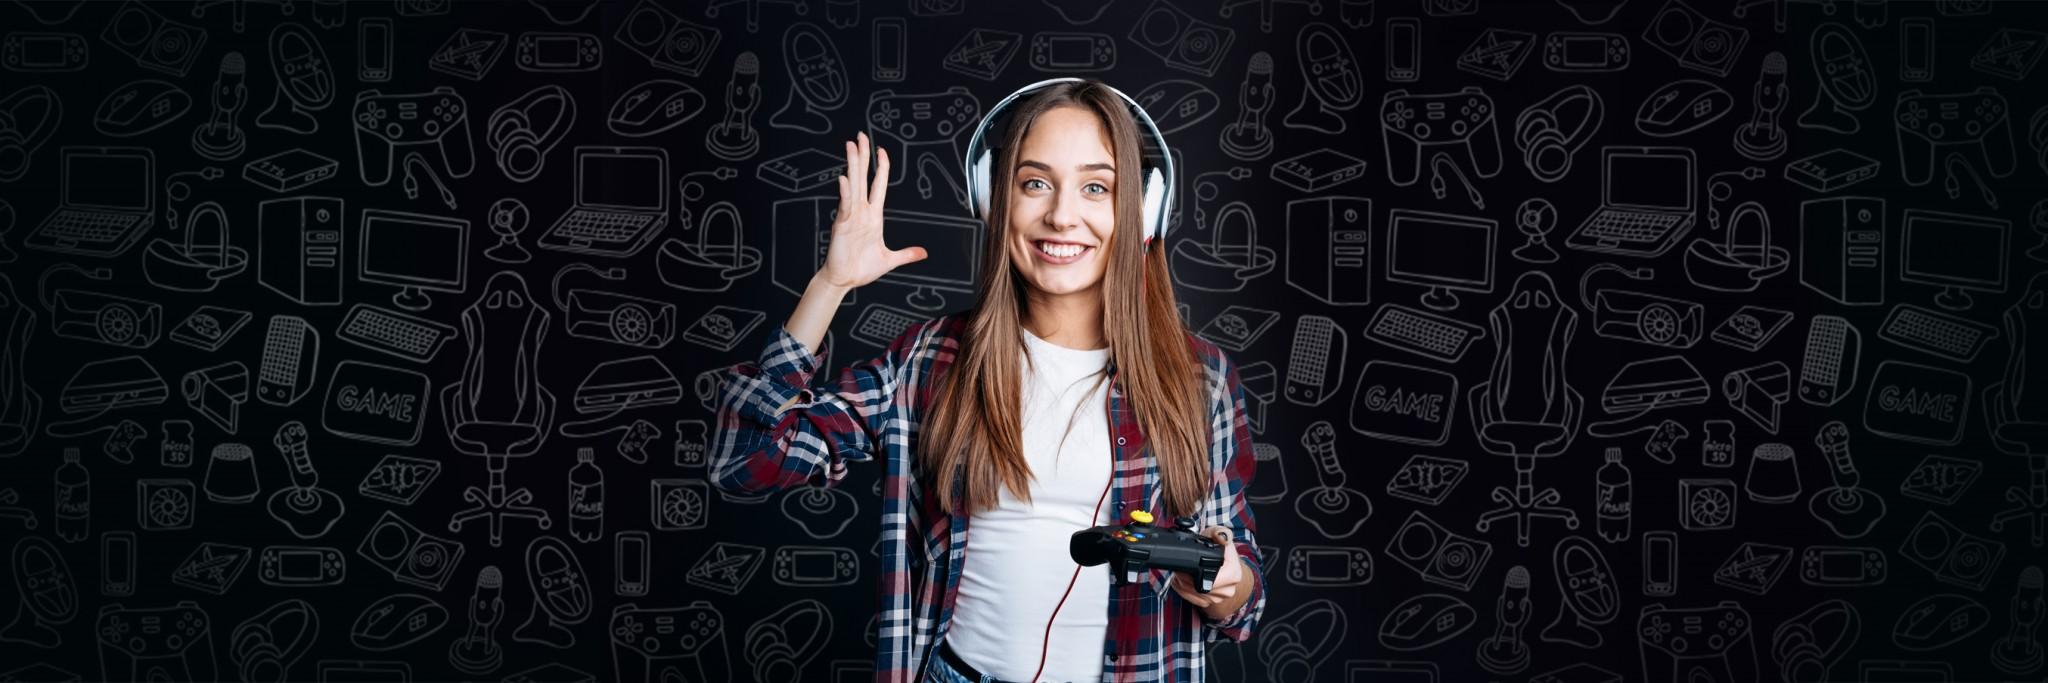 21 Powerful Women in Gaming